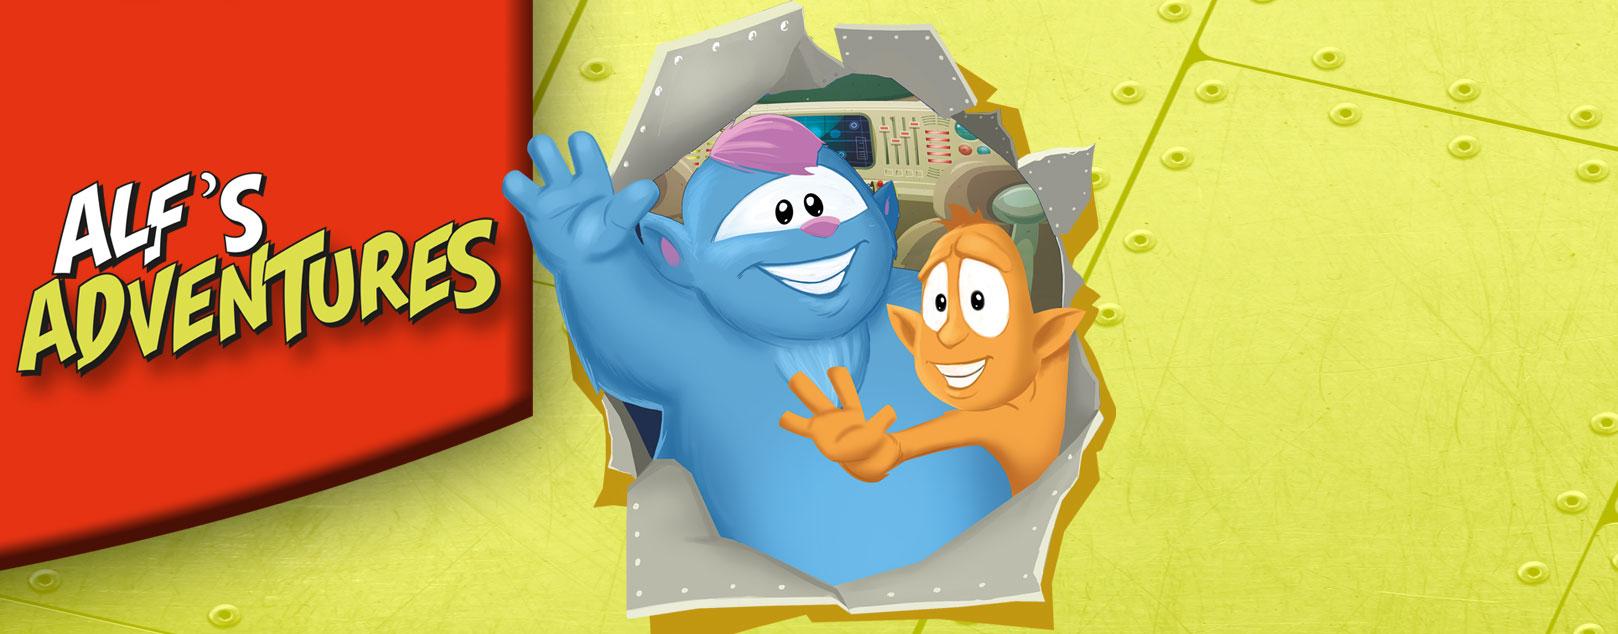 Alf's Adventures - Η πρώτη σειρά βιβλίων της ΕΥΡΩΓΝΩΣΗ για την ΕJ2 αποκλειστικά για τους μαθητές μας.